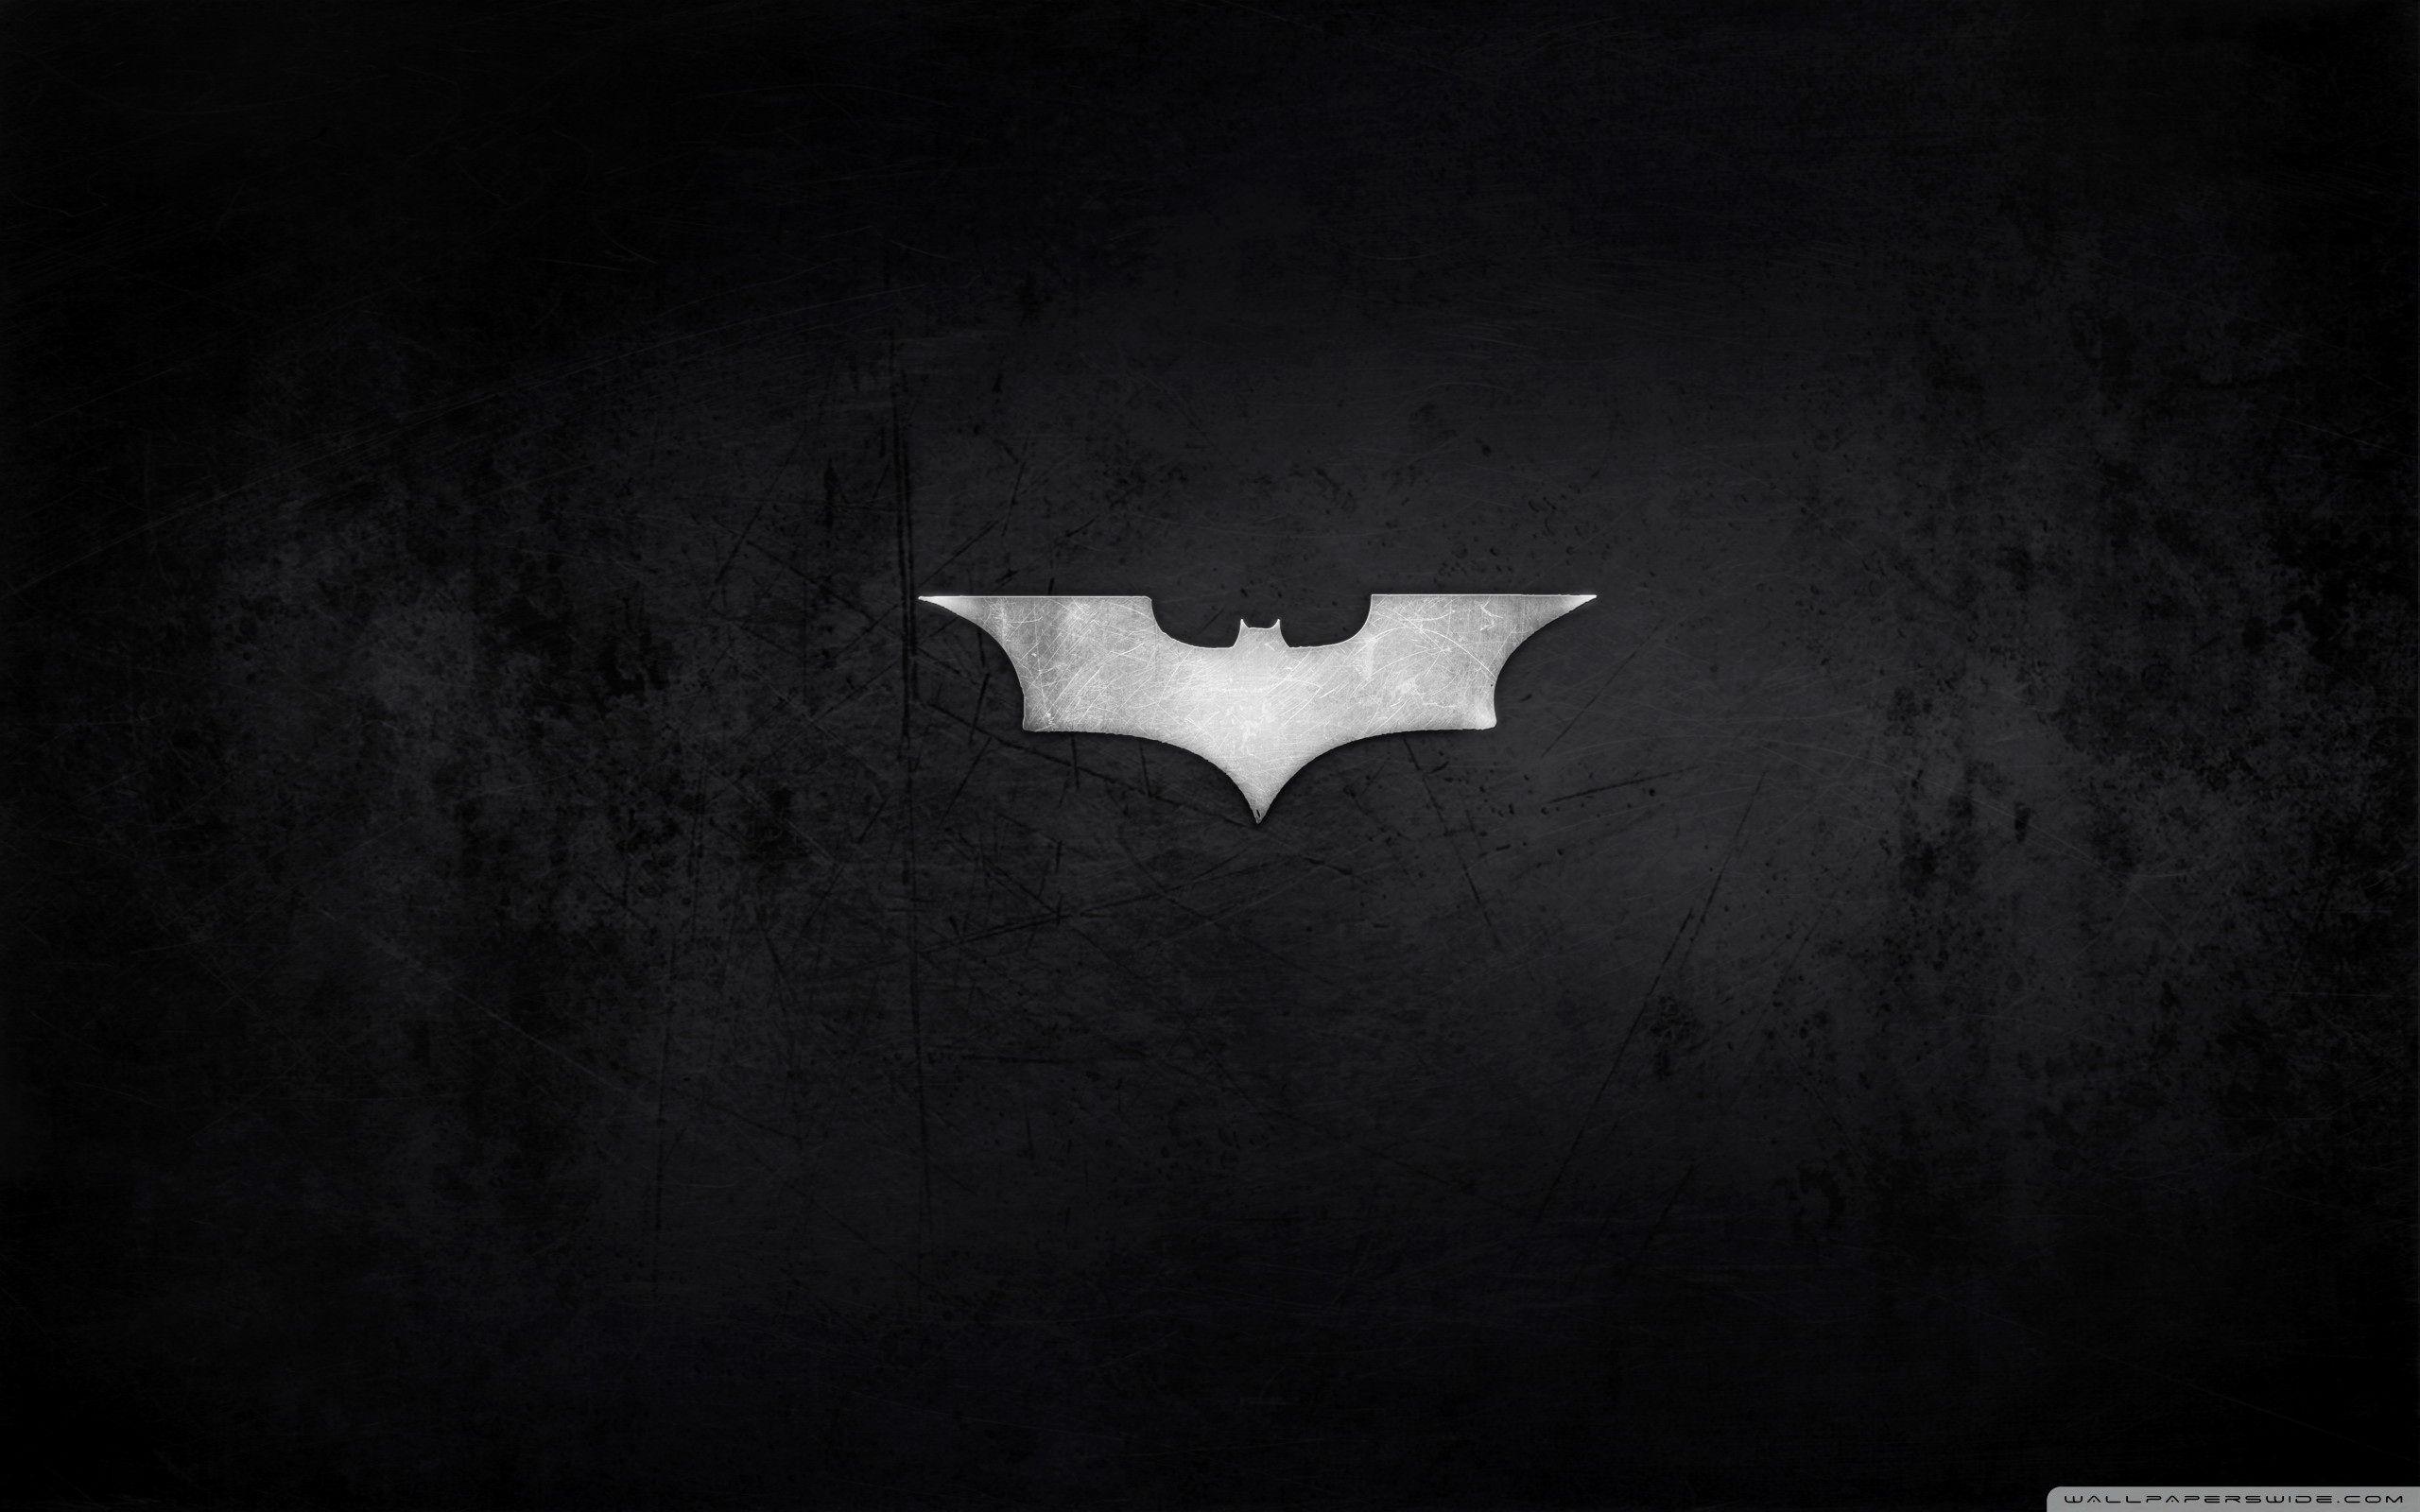 4k Wallpaper For Pc Zip Ideas Batman Wallpaper Batman Backgrounds Cool Batman Wallpapers